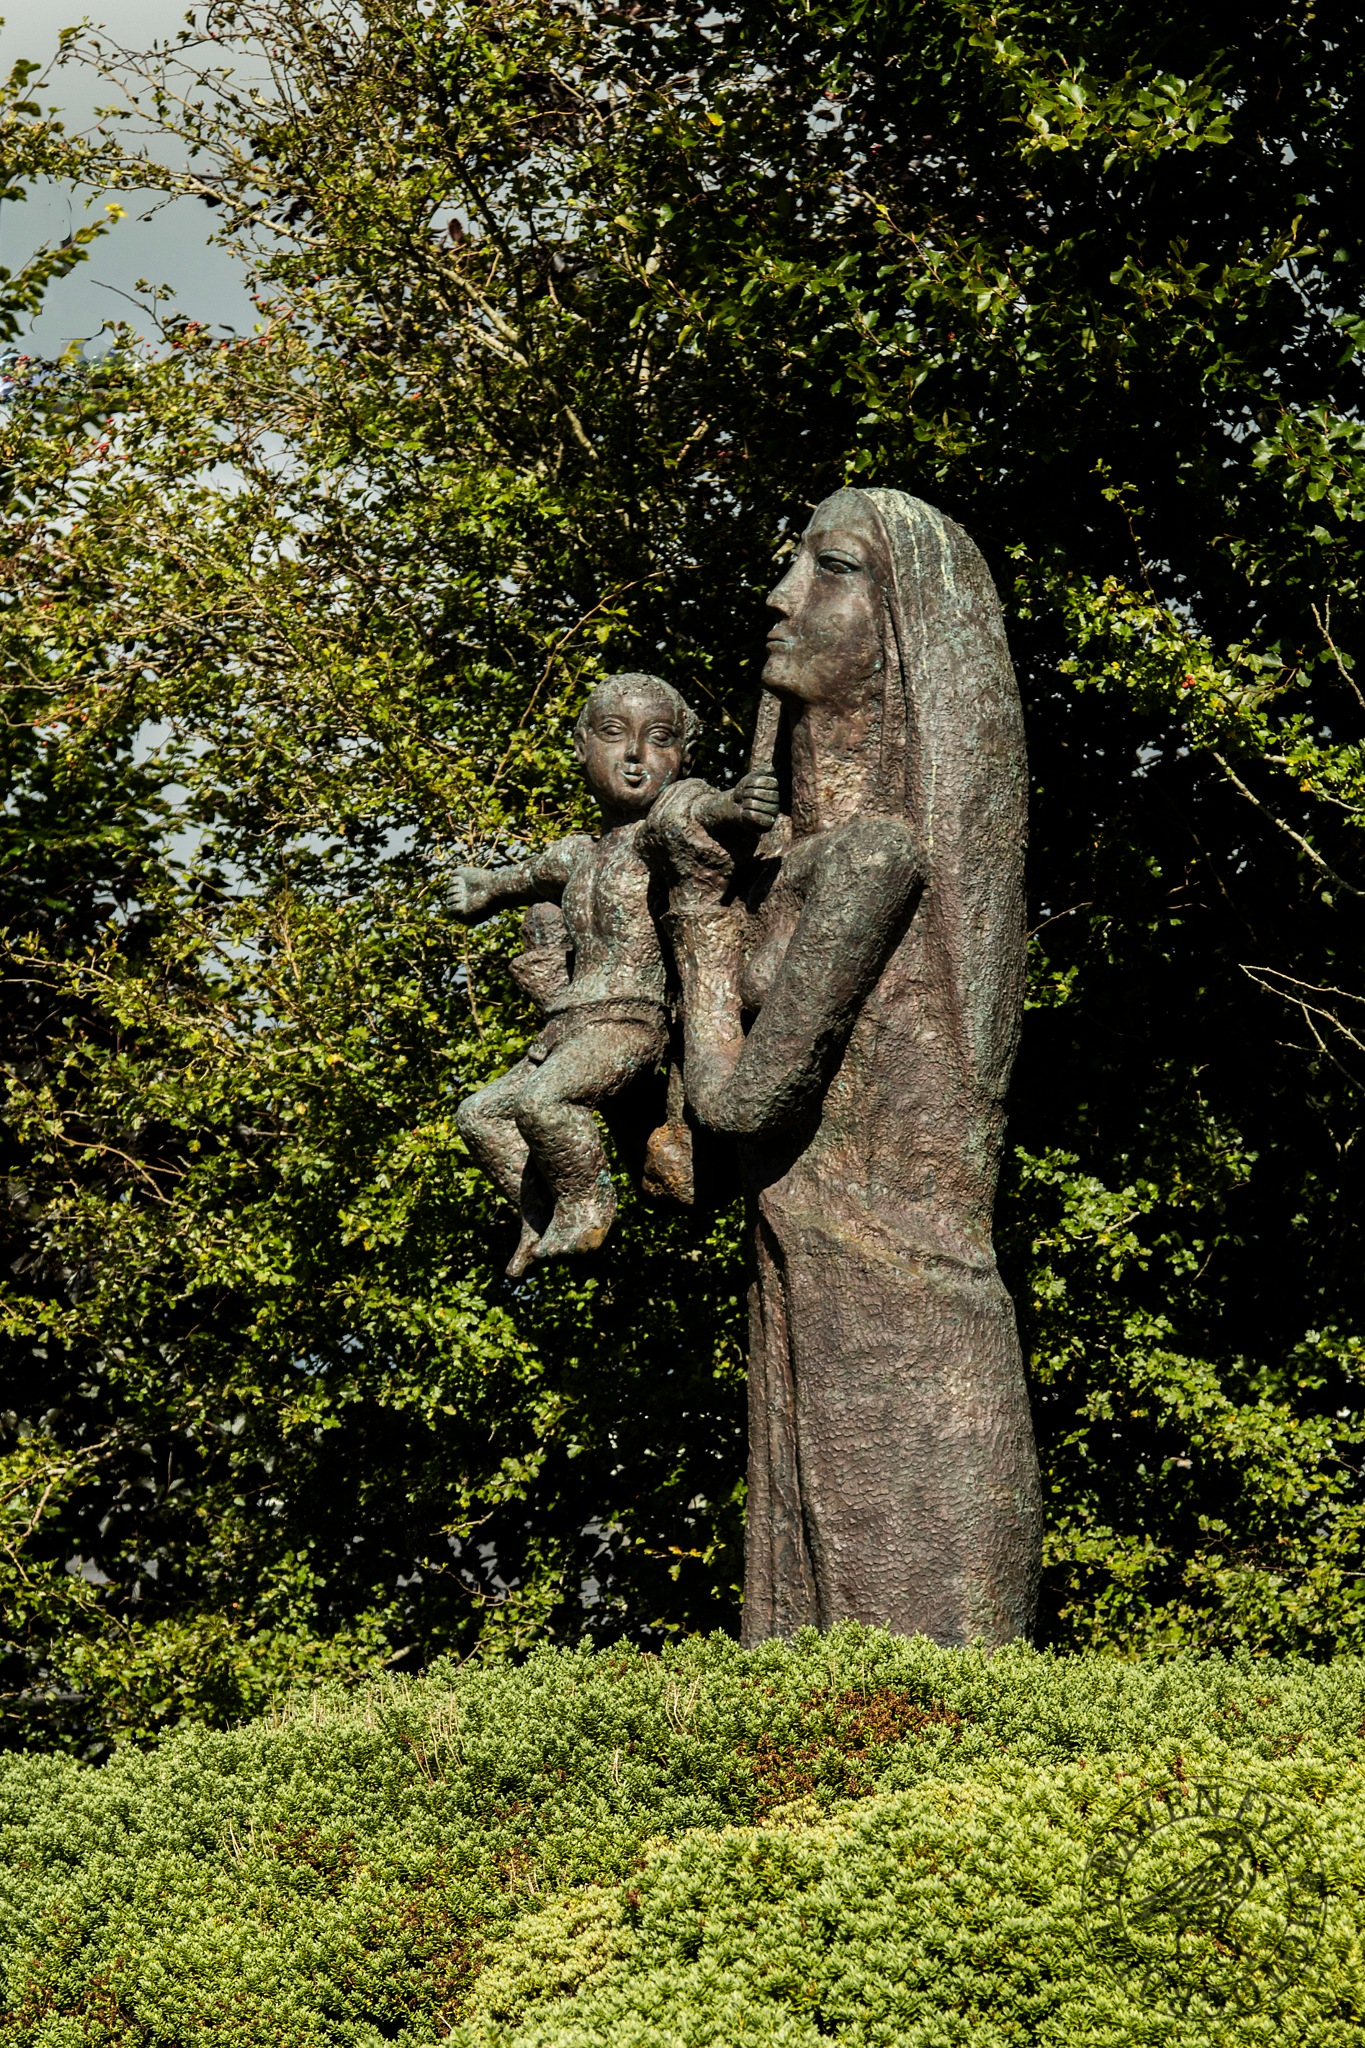 Madonna & Child by Declan Byrne